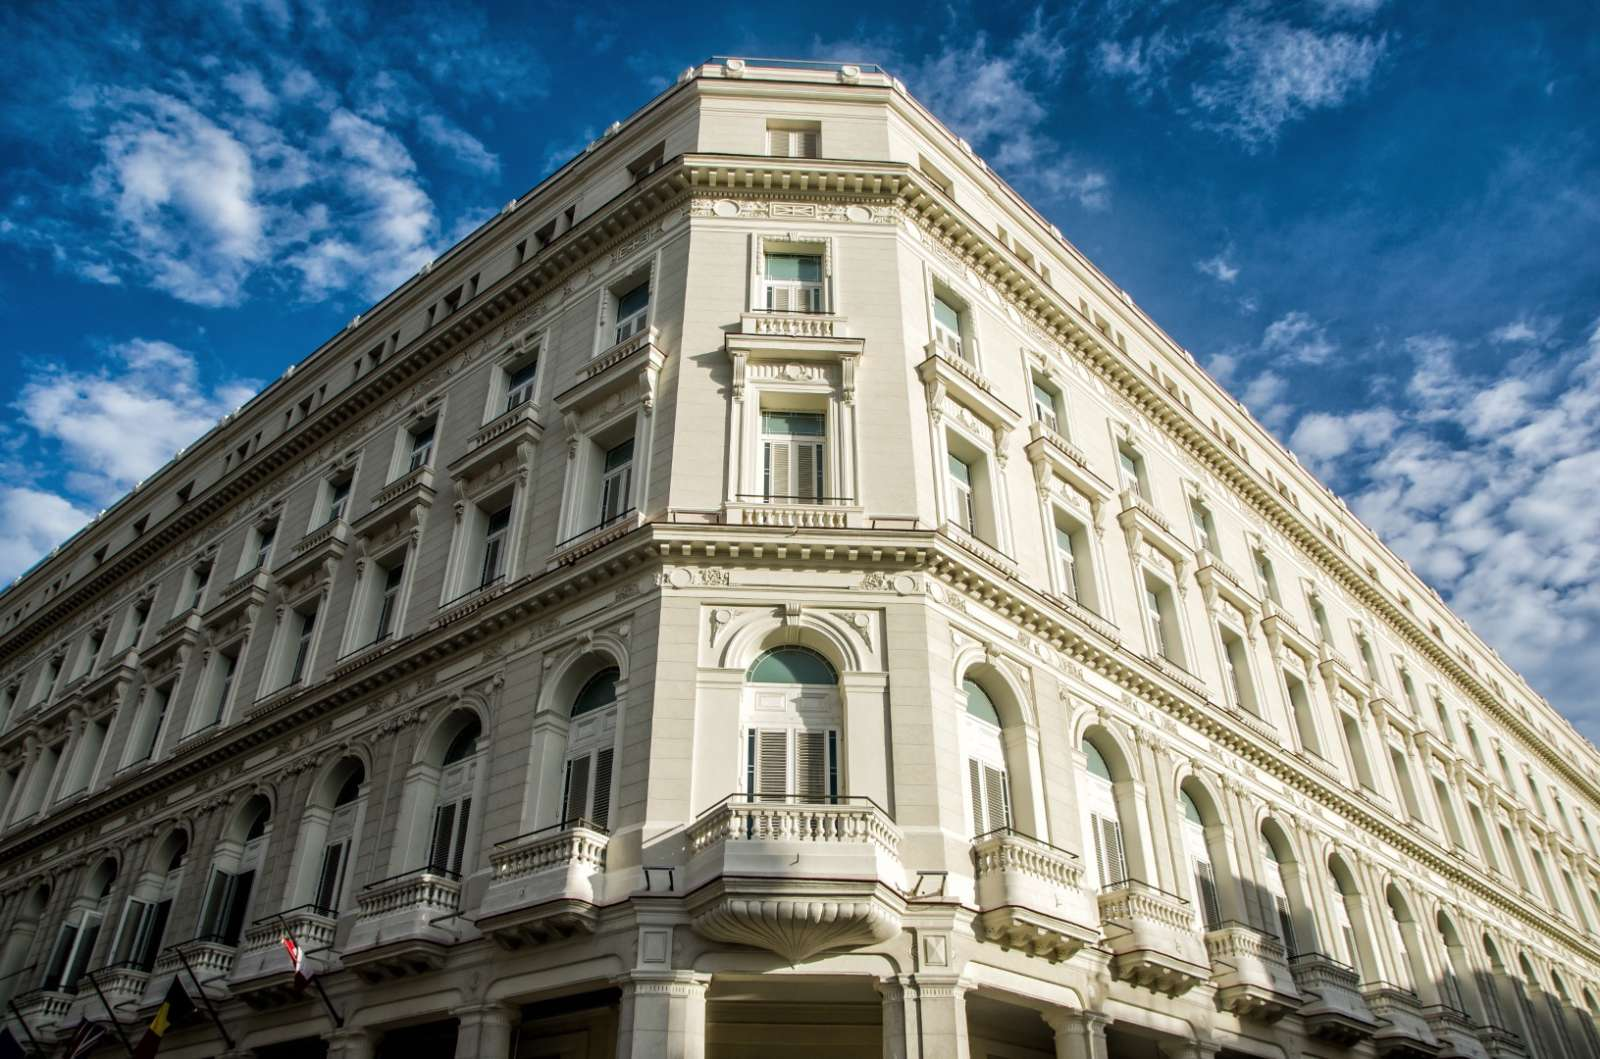 Exterior of the Kempinski Havana hotel in Cuba